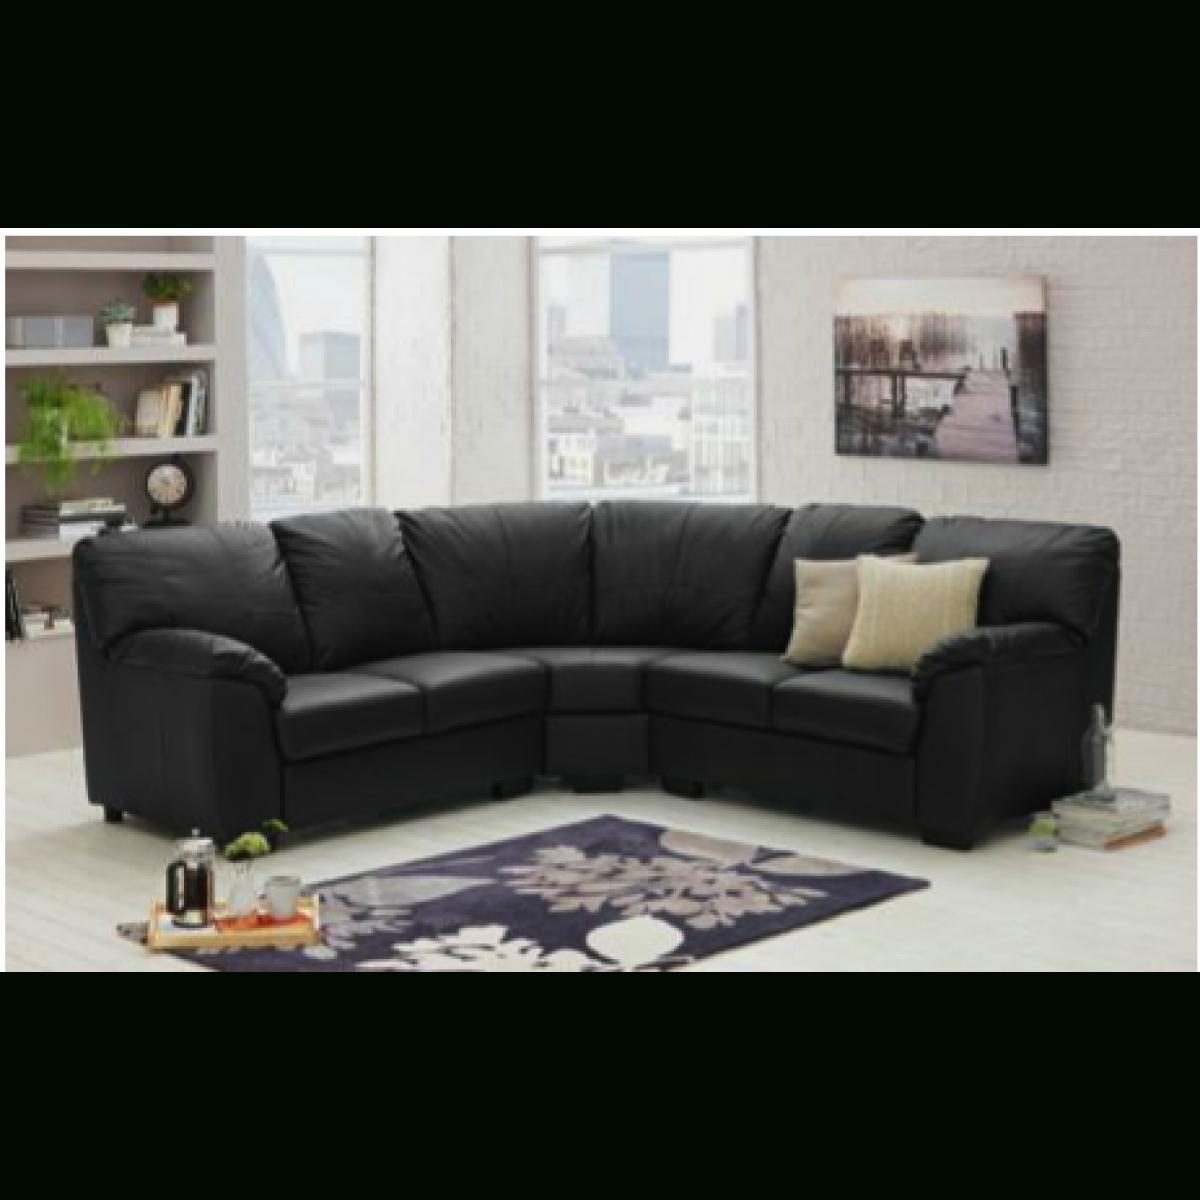 Milano Leather Dual Facing Corner Sofa Group – Black – Furnico Village Inside Black Corner Sofas (Image 14 of 20)